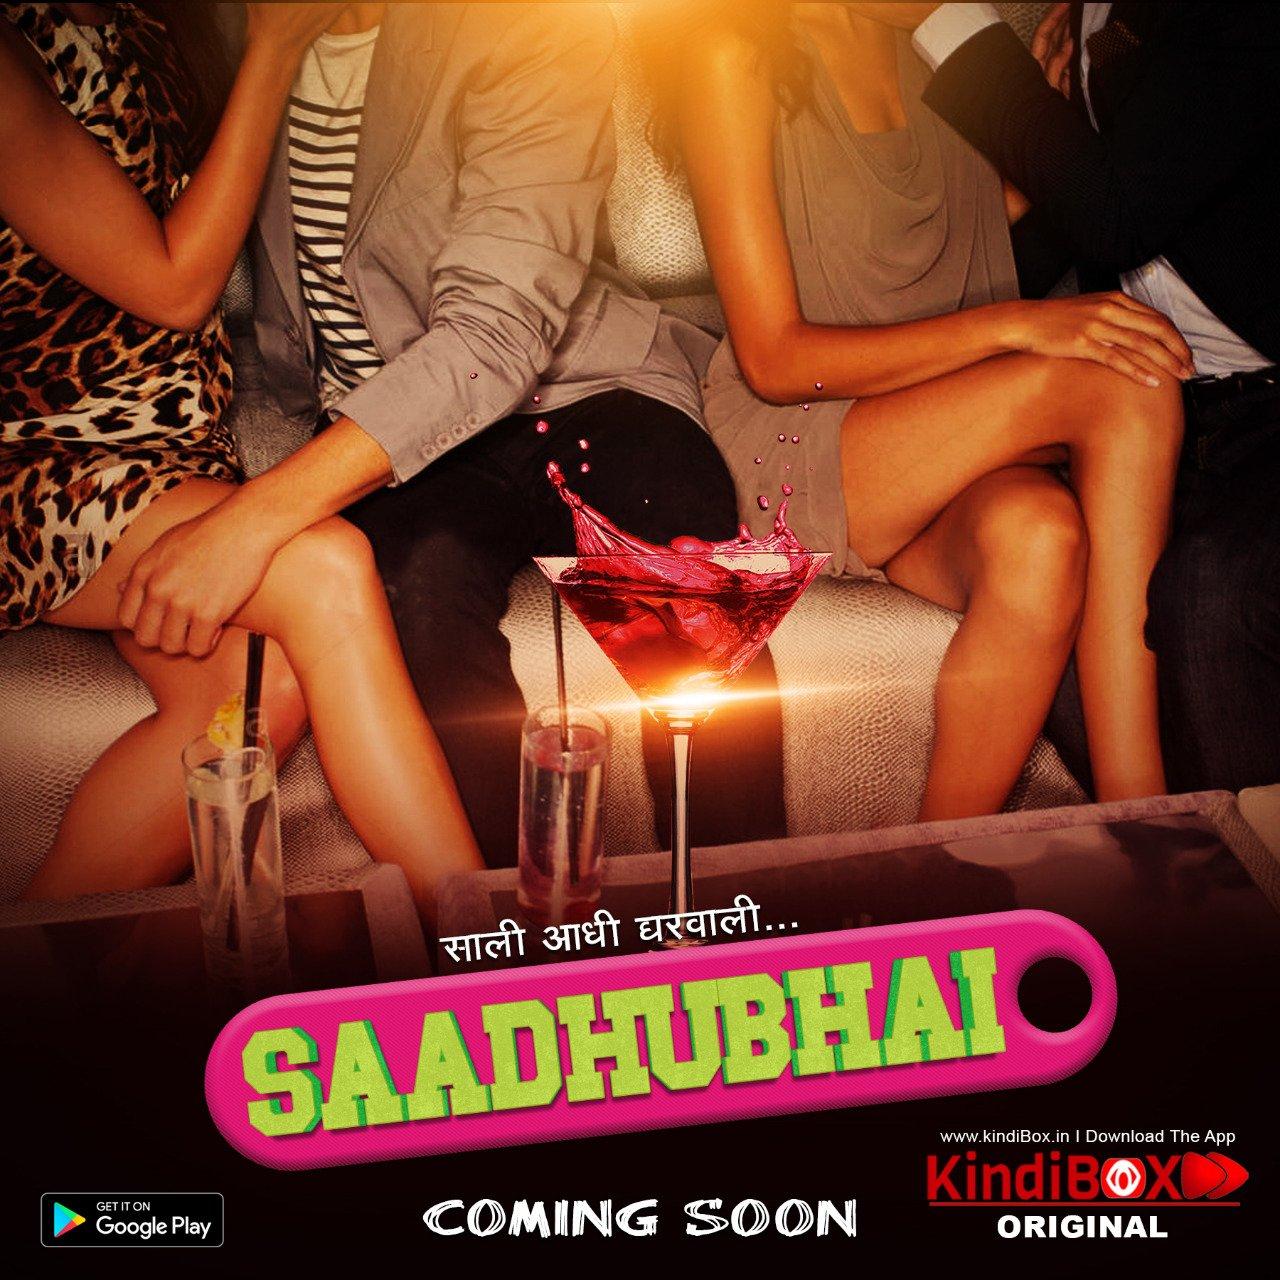 Saadhubhai 2020 Hindi S01E01 Kindibox Web Series 720p HDRip 250MB Download